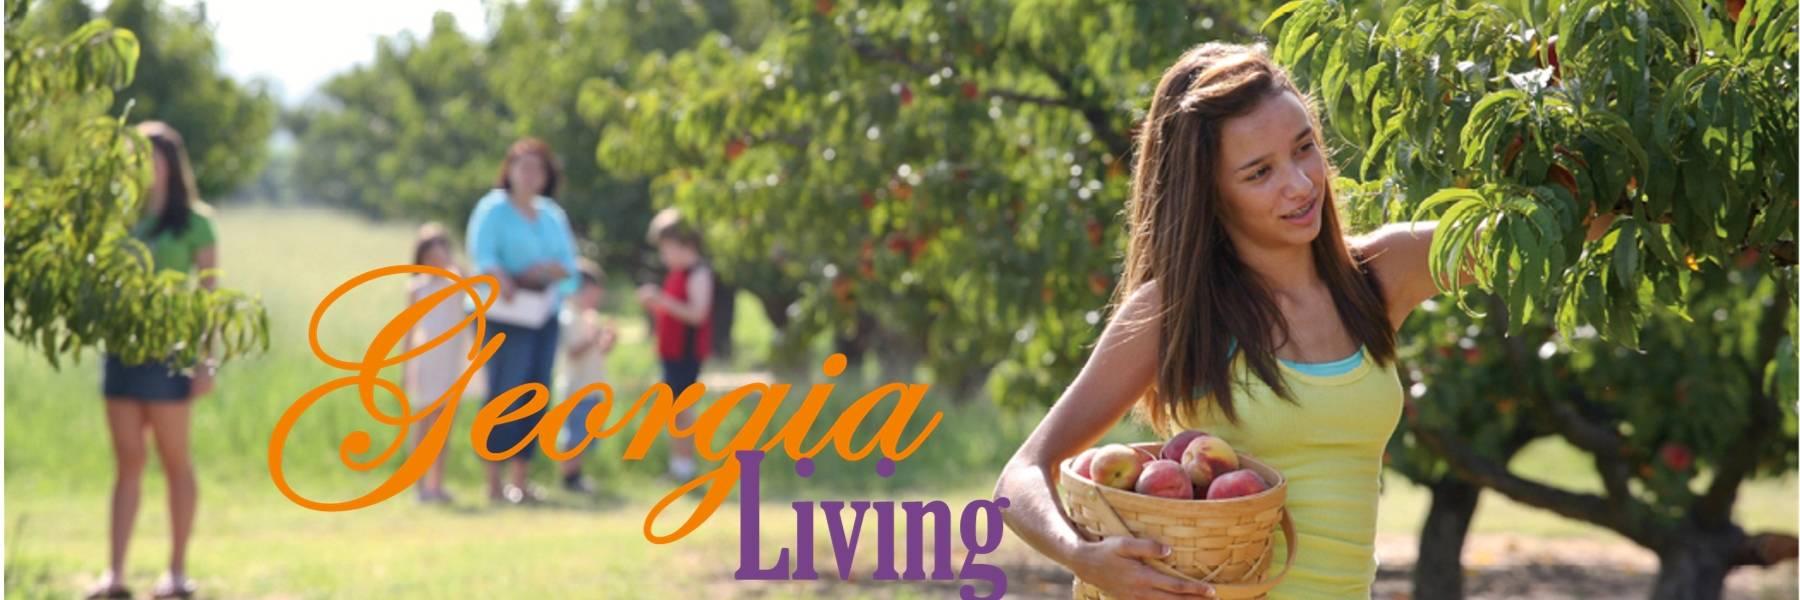 Georgia Living Coming Soon!